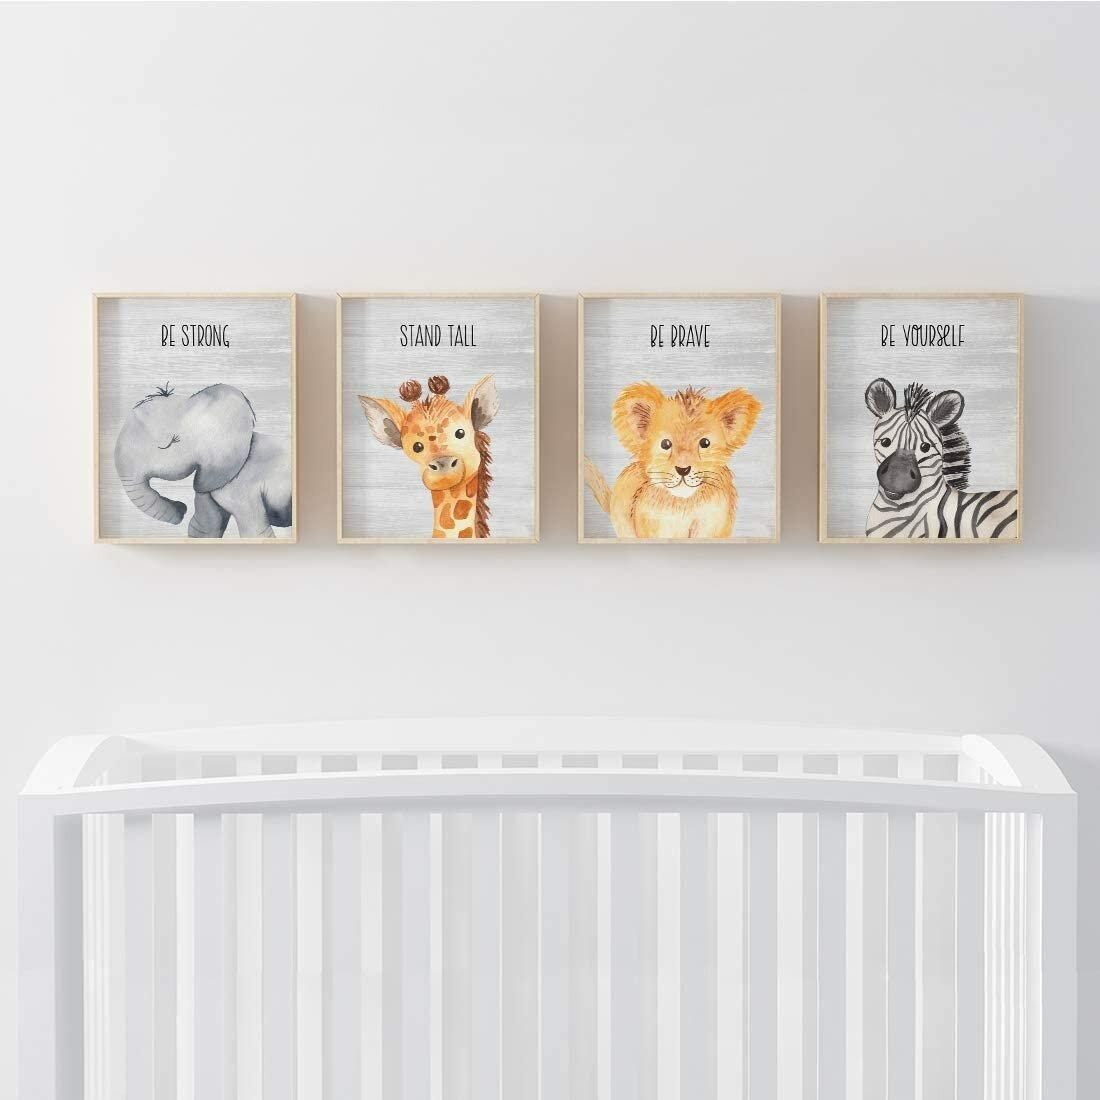 Harriet Bee Inspirational Nursery Room Wall Art Baby Animals Elephant Giraffe Lion Zebra Grey Rustic Wood Reviews Wayfair Ca